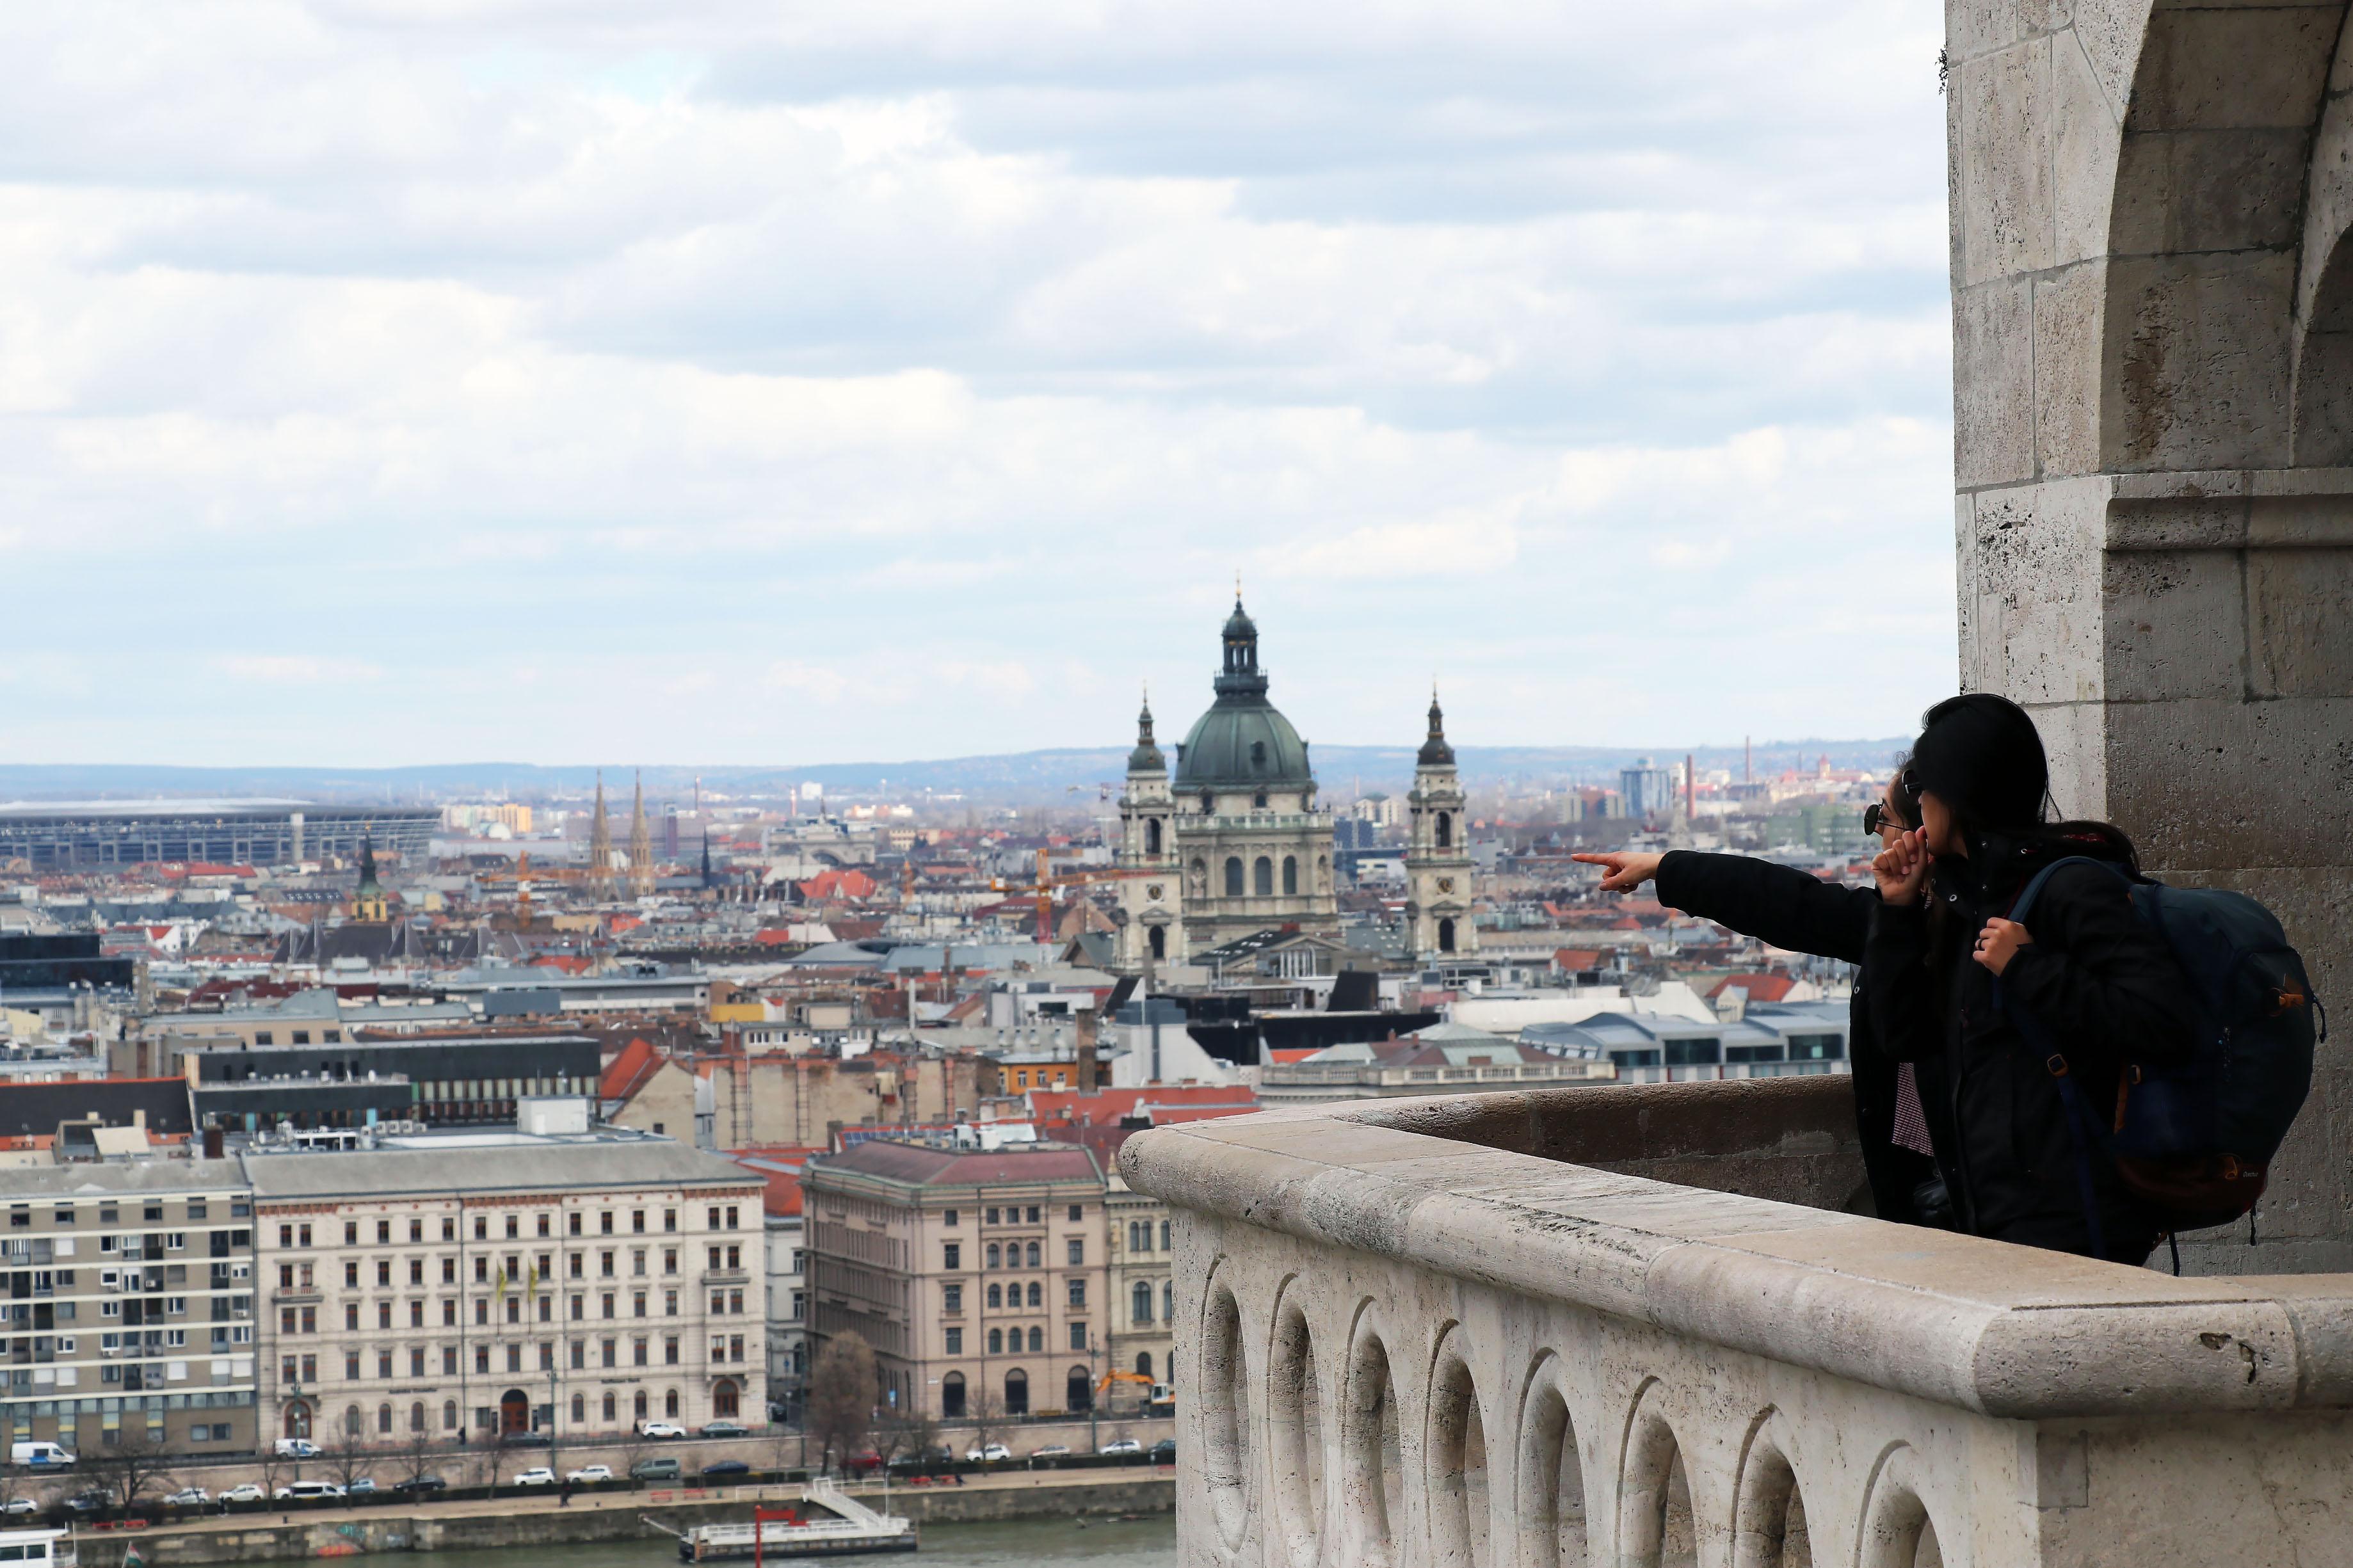 budapest toursim tourist Hungary kató alpár